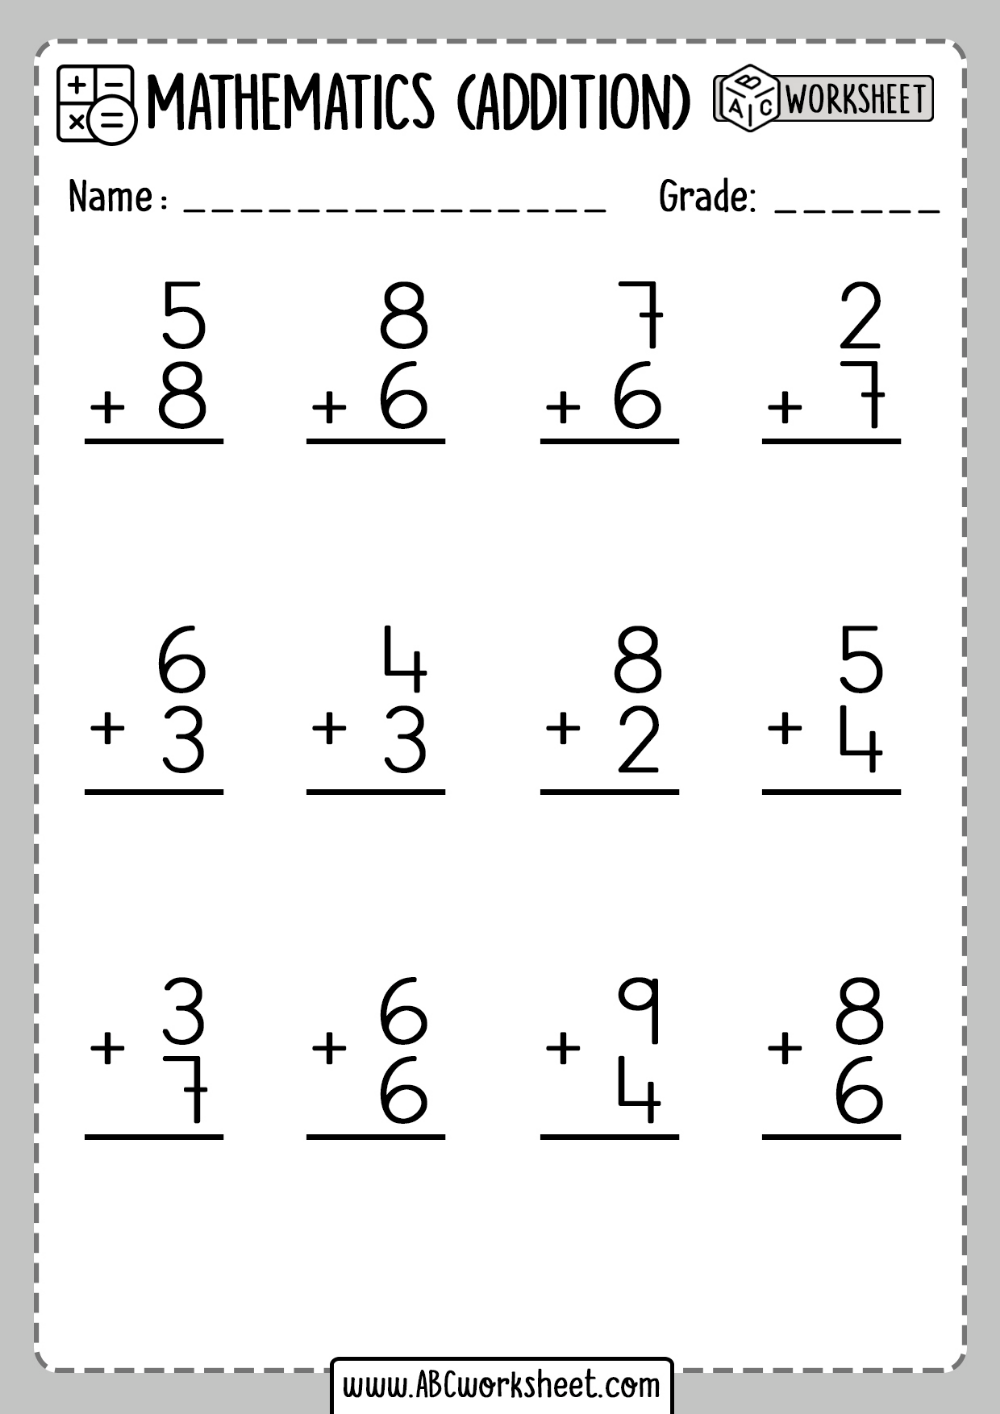 hight resolution of Addition Worksheet First Grade   Addition worksheets